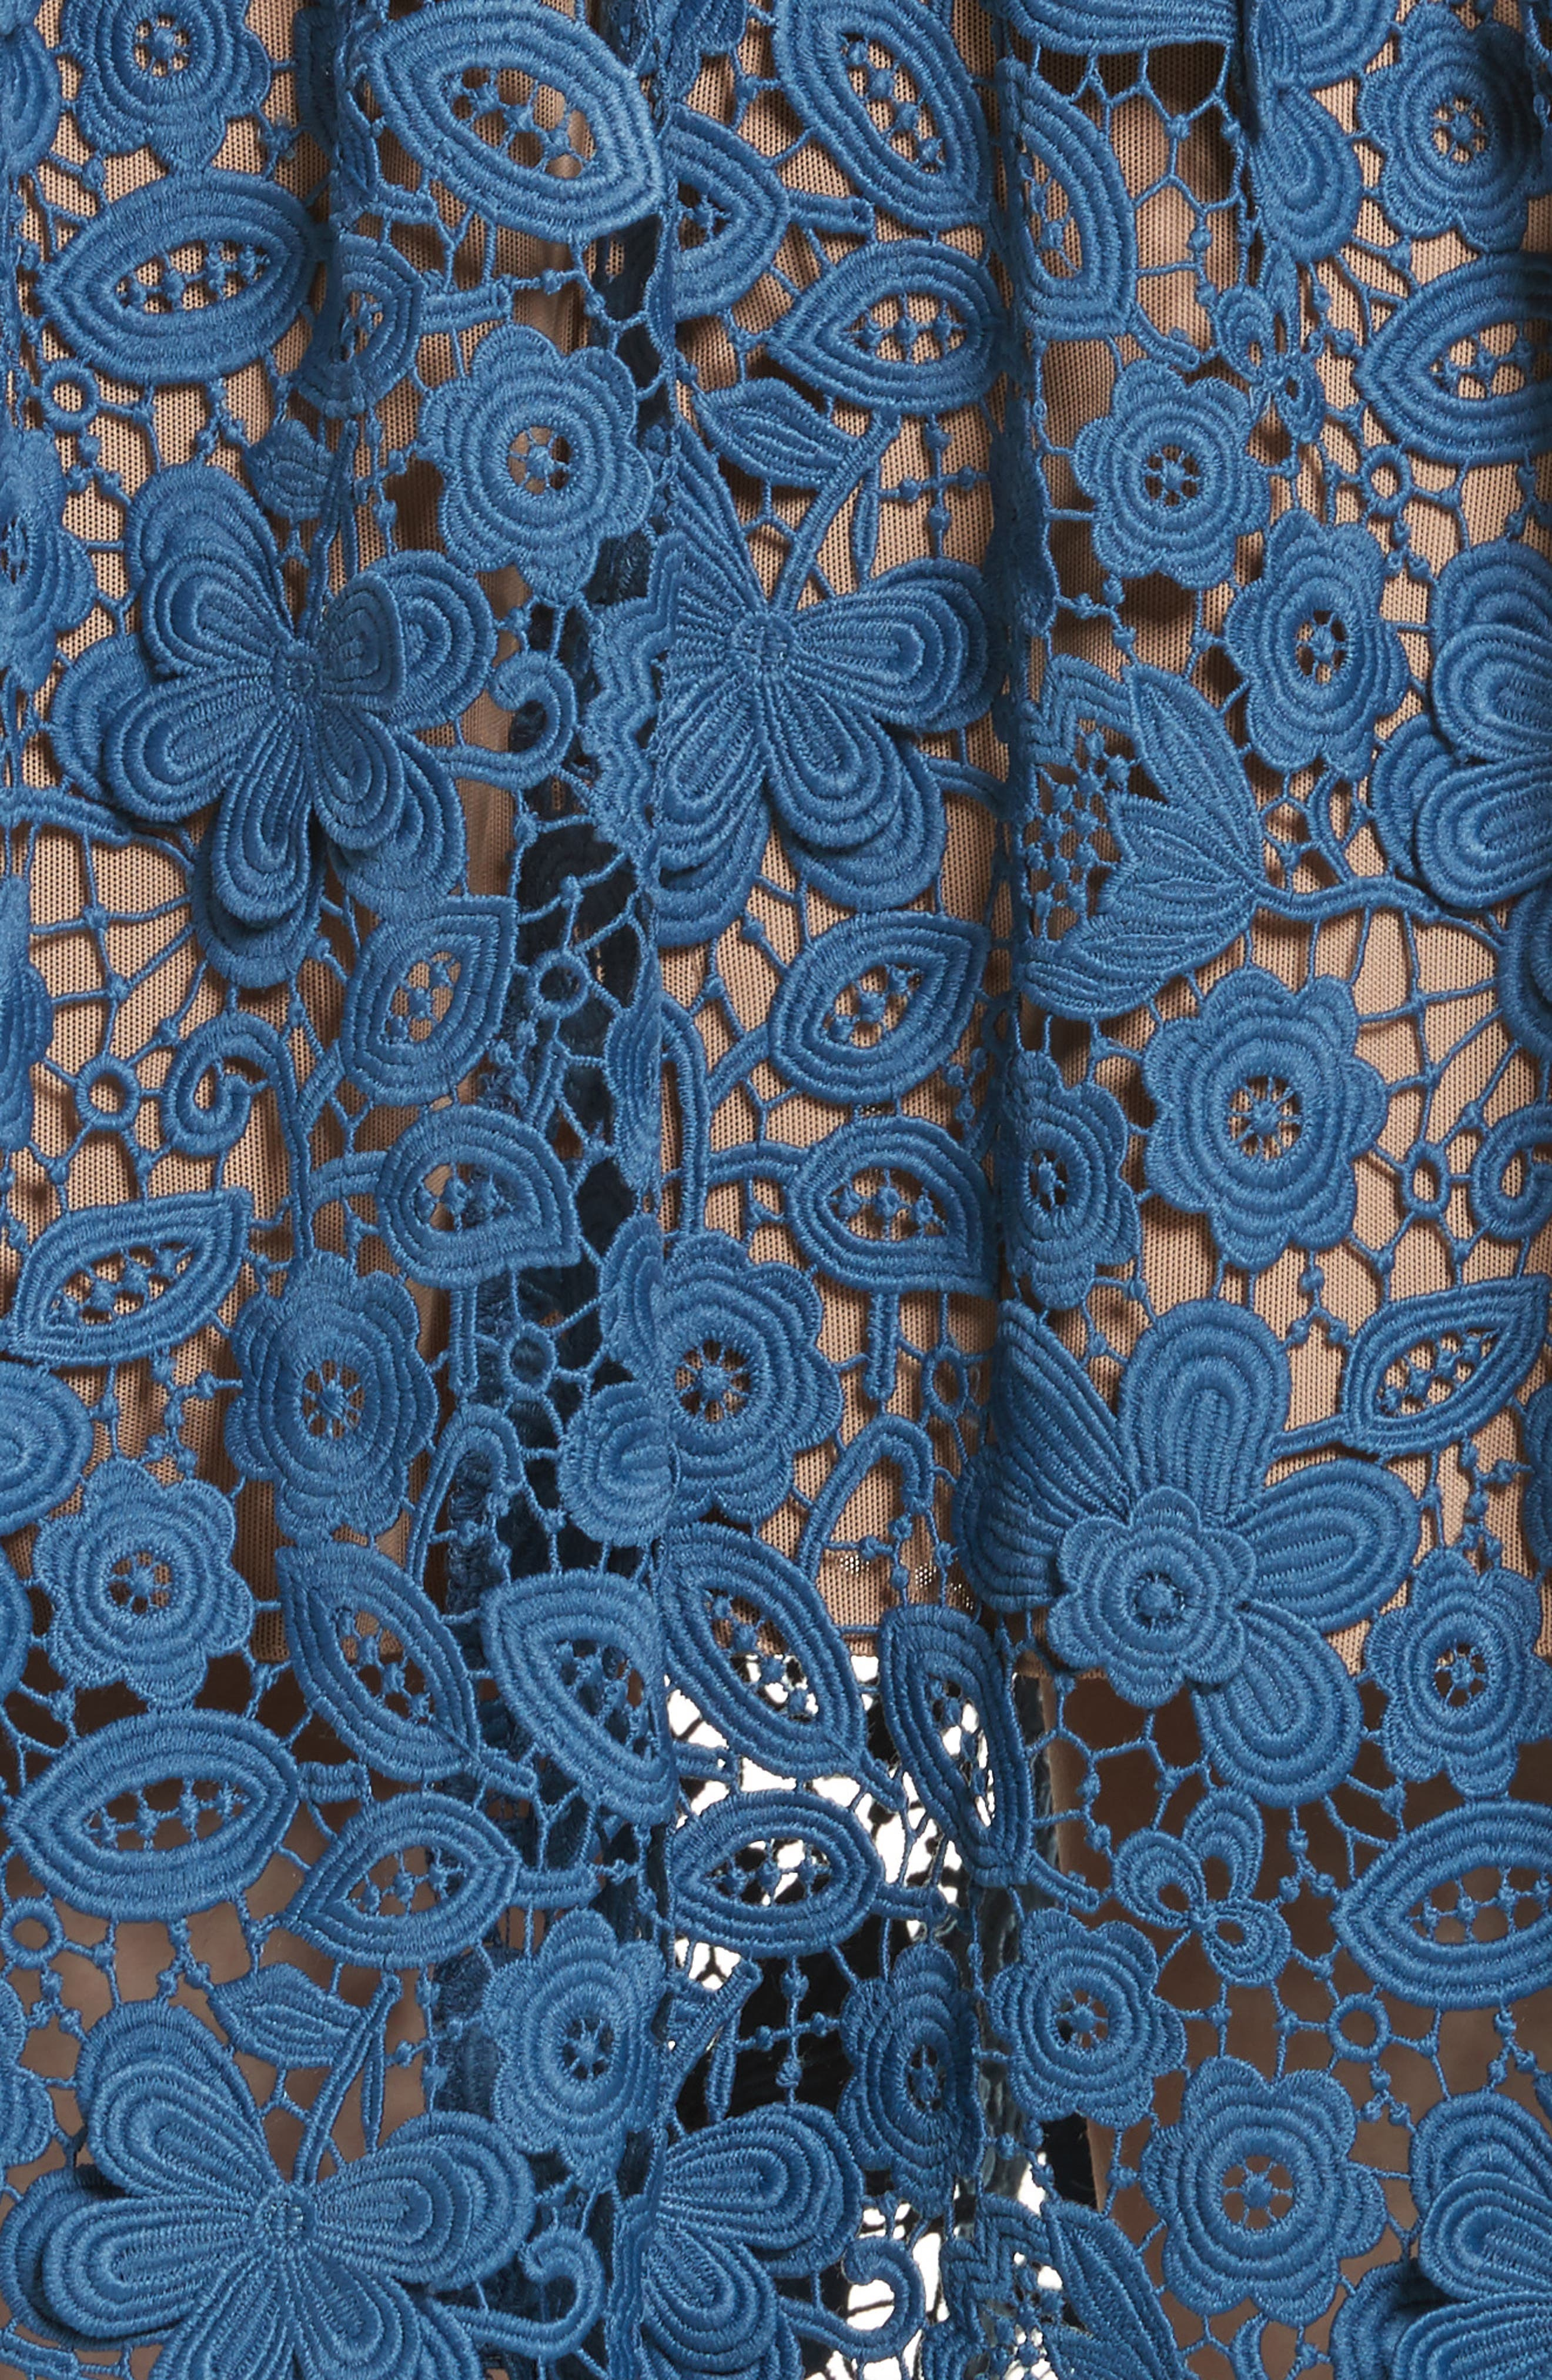 Azaelea 3D Lace Fit & Flare Dress,                             Alternate thumbnail 5, color,                             SLATE BLUE